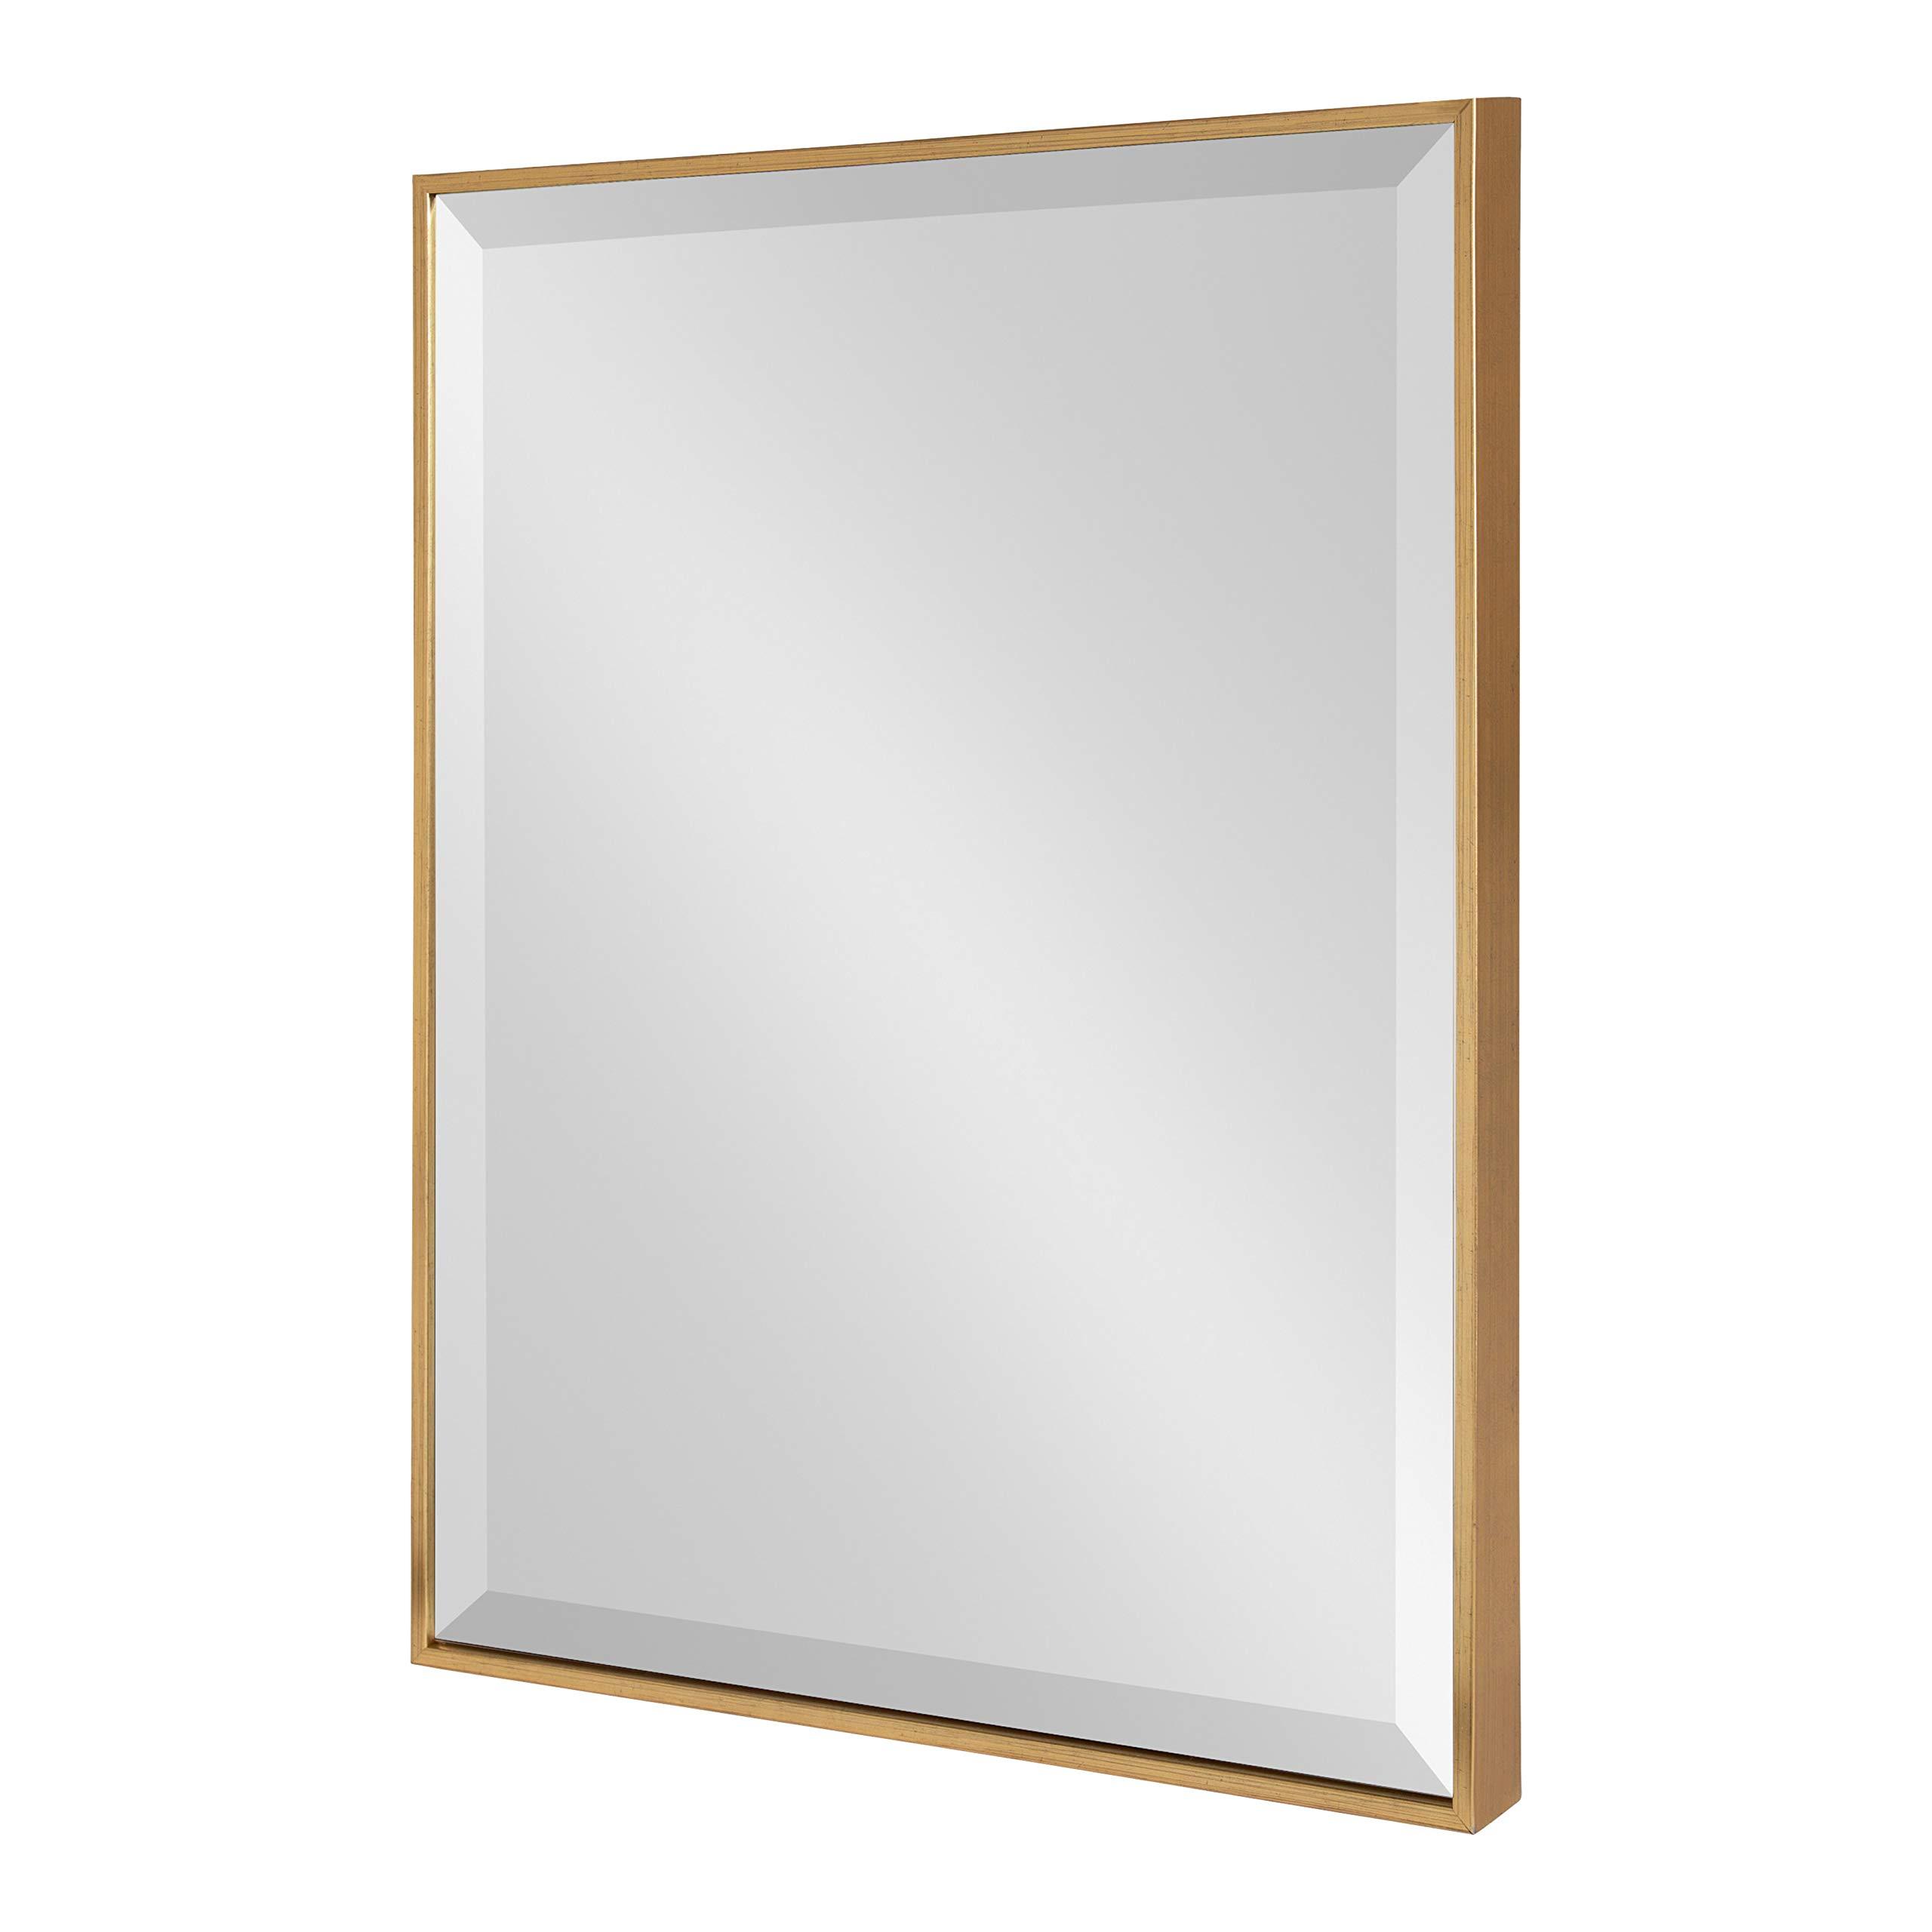 Detalles Acerca De Kate And Laurel Rhodes Enmarcado Rectángulo Decorativo  Espejo De Pared, 22 X 28 Oro  Mostrar Título Original Within Well Liked Caja Rectangle Glass Frame Wall Mirrors (View 14 of 20)